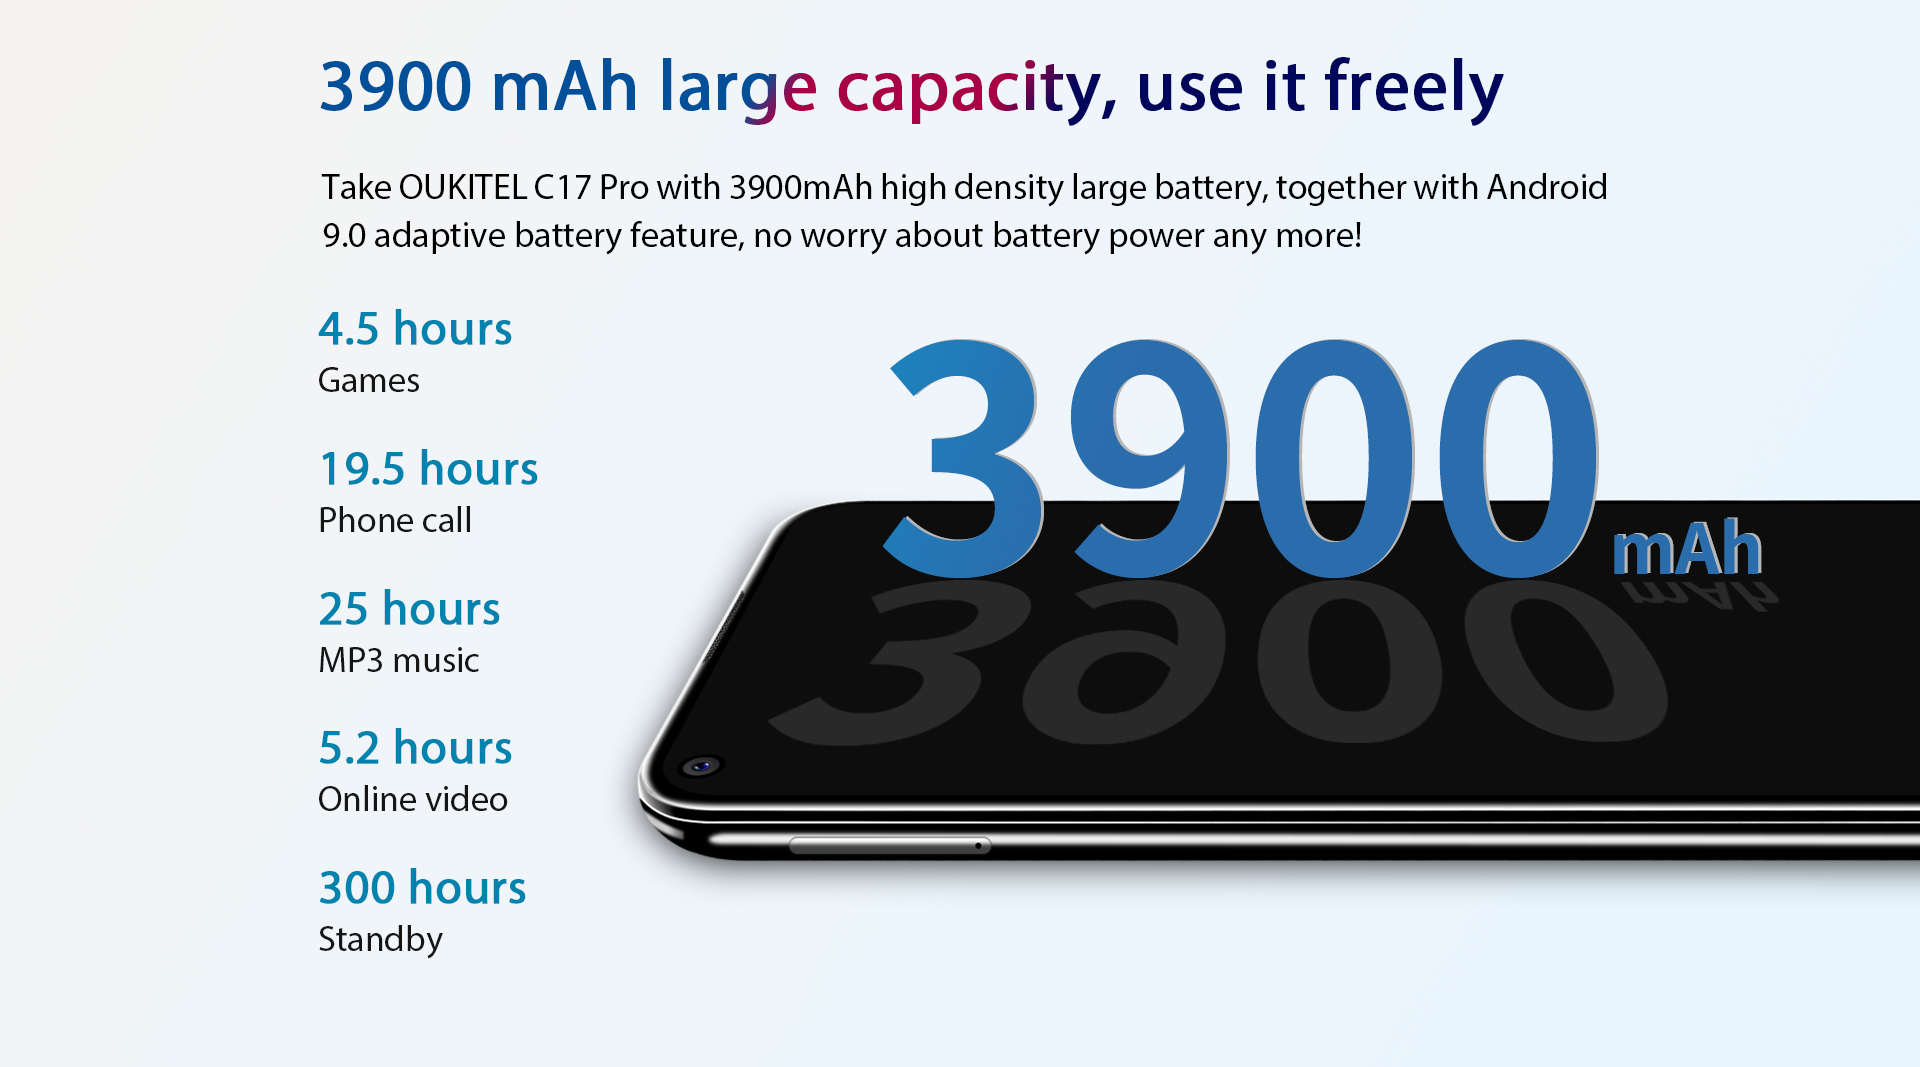 C17PRO 5V2A OCTA Android 20